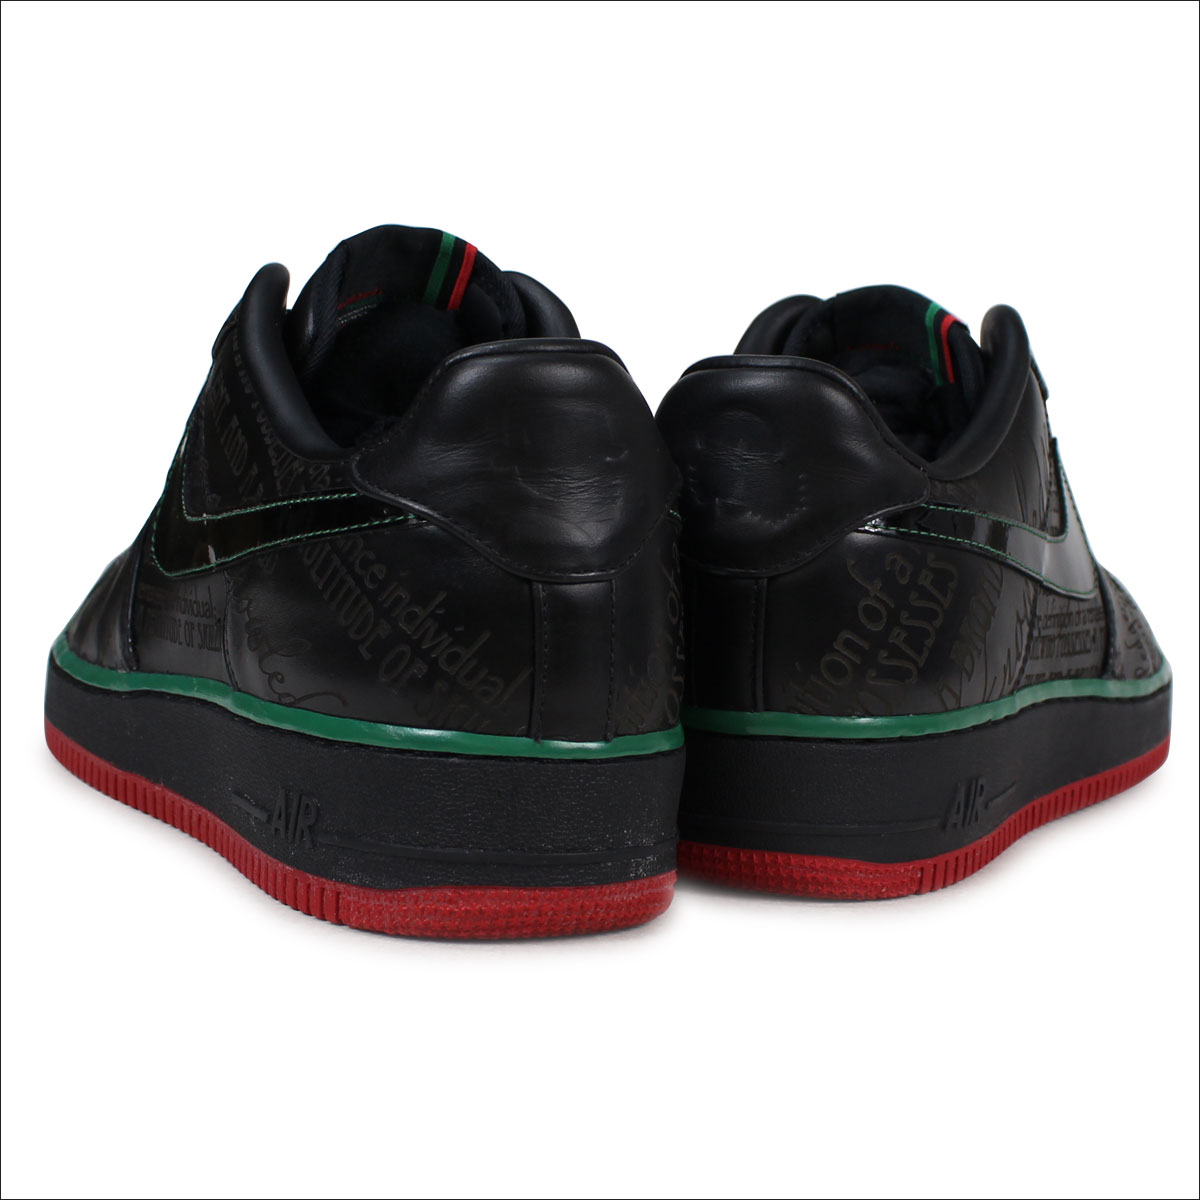 FORCE 318 775 shoes NIKE 1 008 black Nike AIR men's air sneakers PREMIUM force 1 BLACK LOW HISTORY 2YEI9DWH